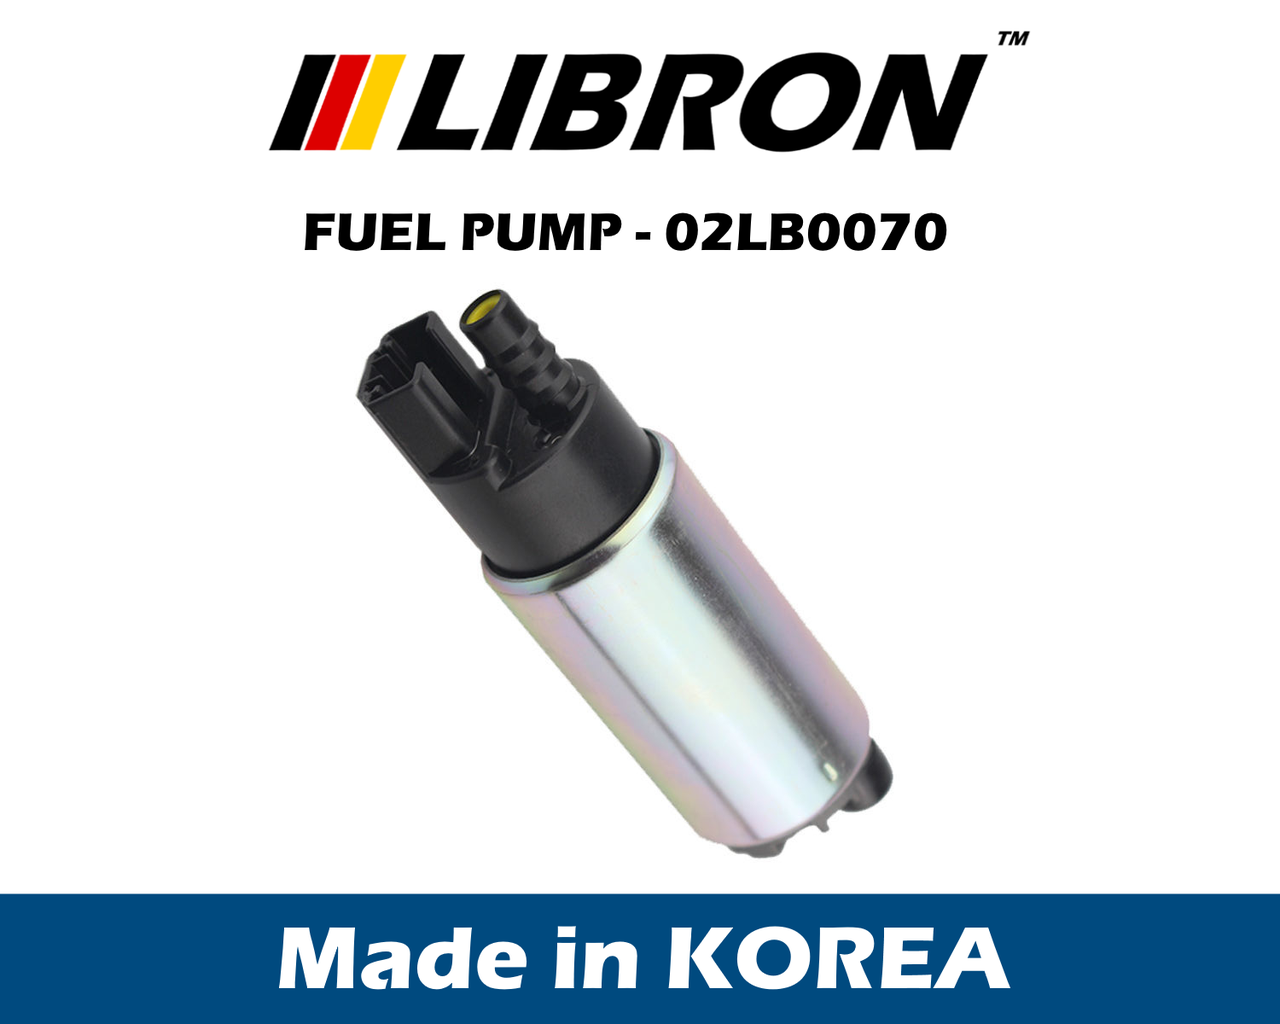 Бензонасос LIBRON 02LB0070 - Honda CIVIC VI (1996-2000)